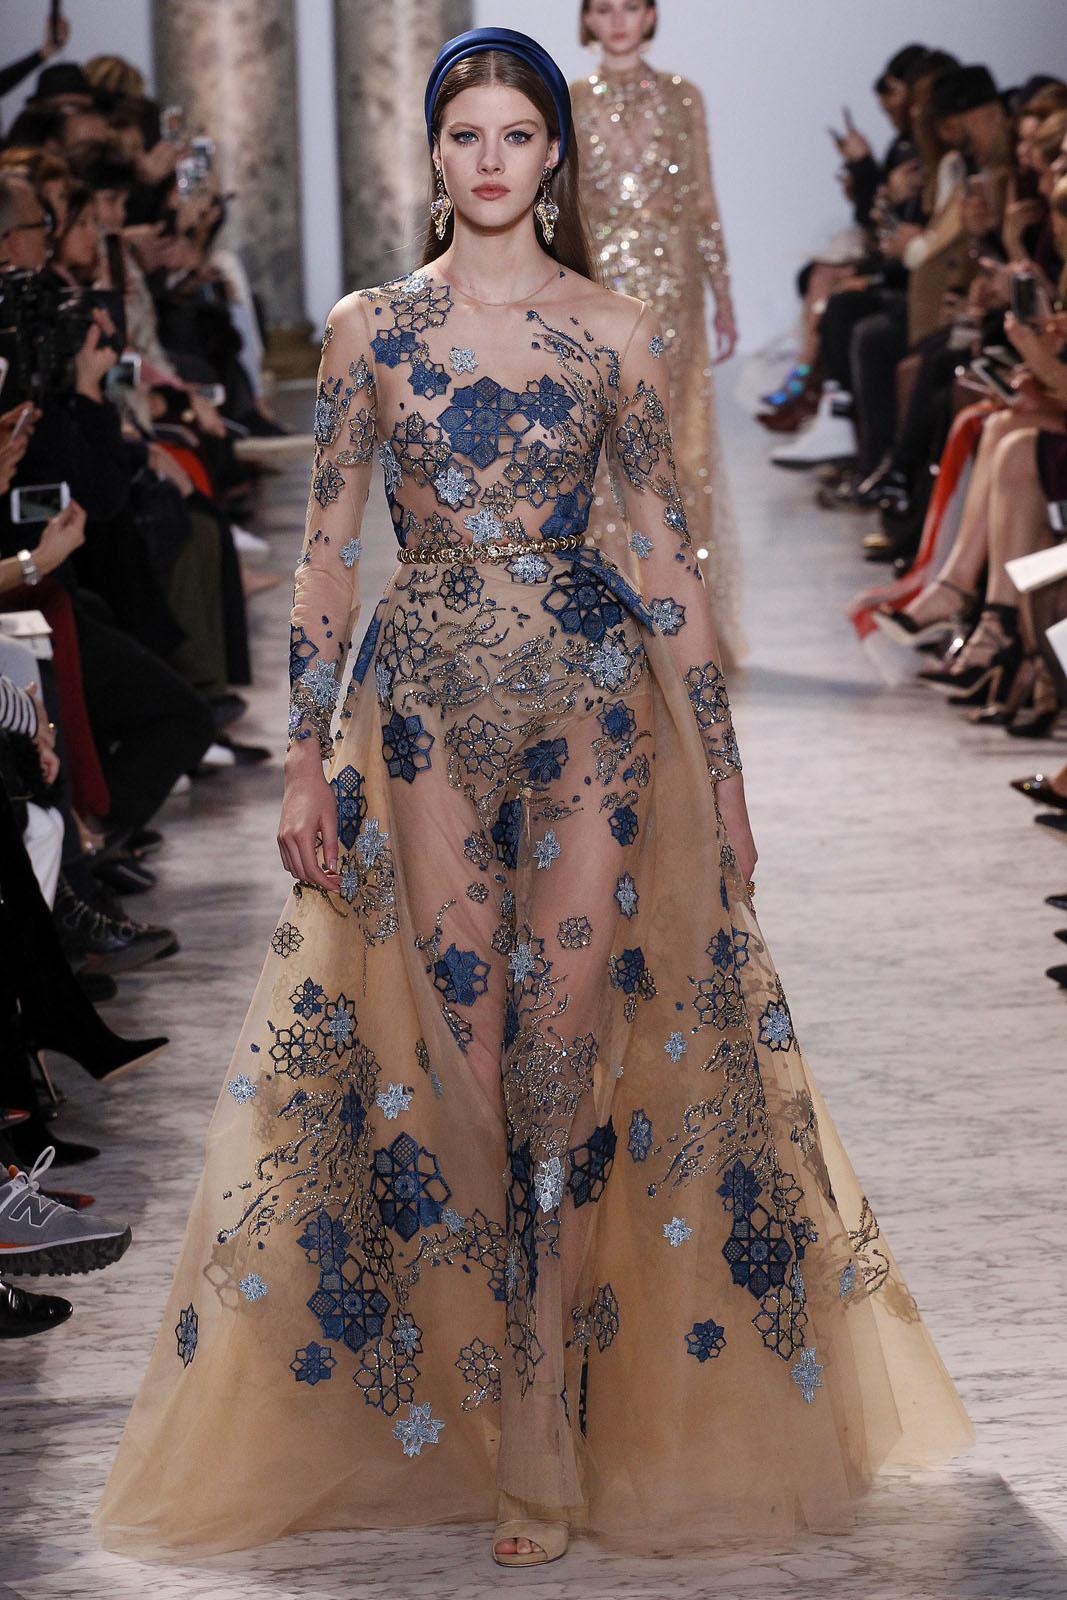 2017 Haute Couture Elie Saab